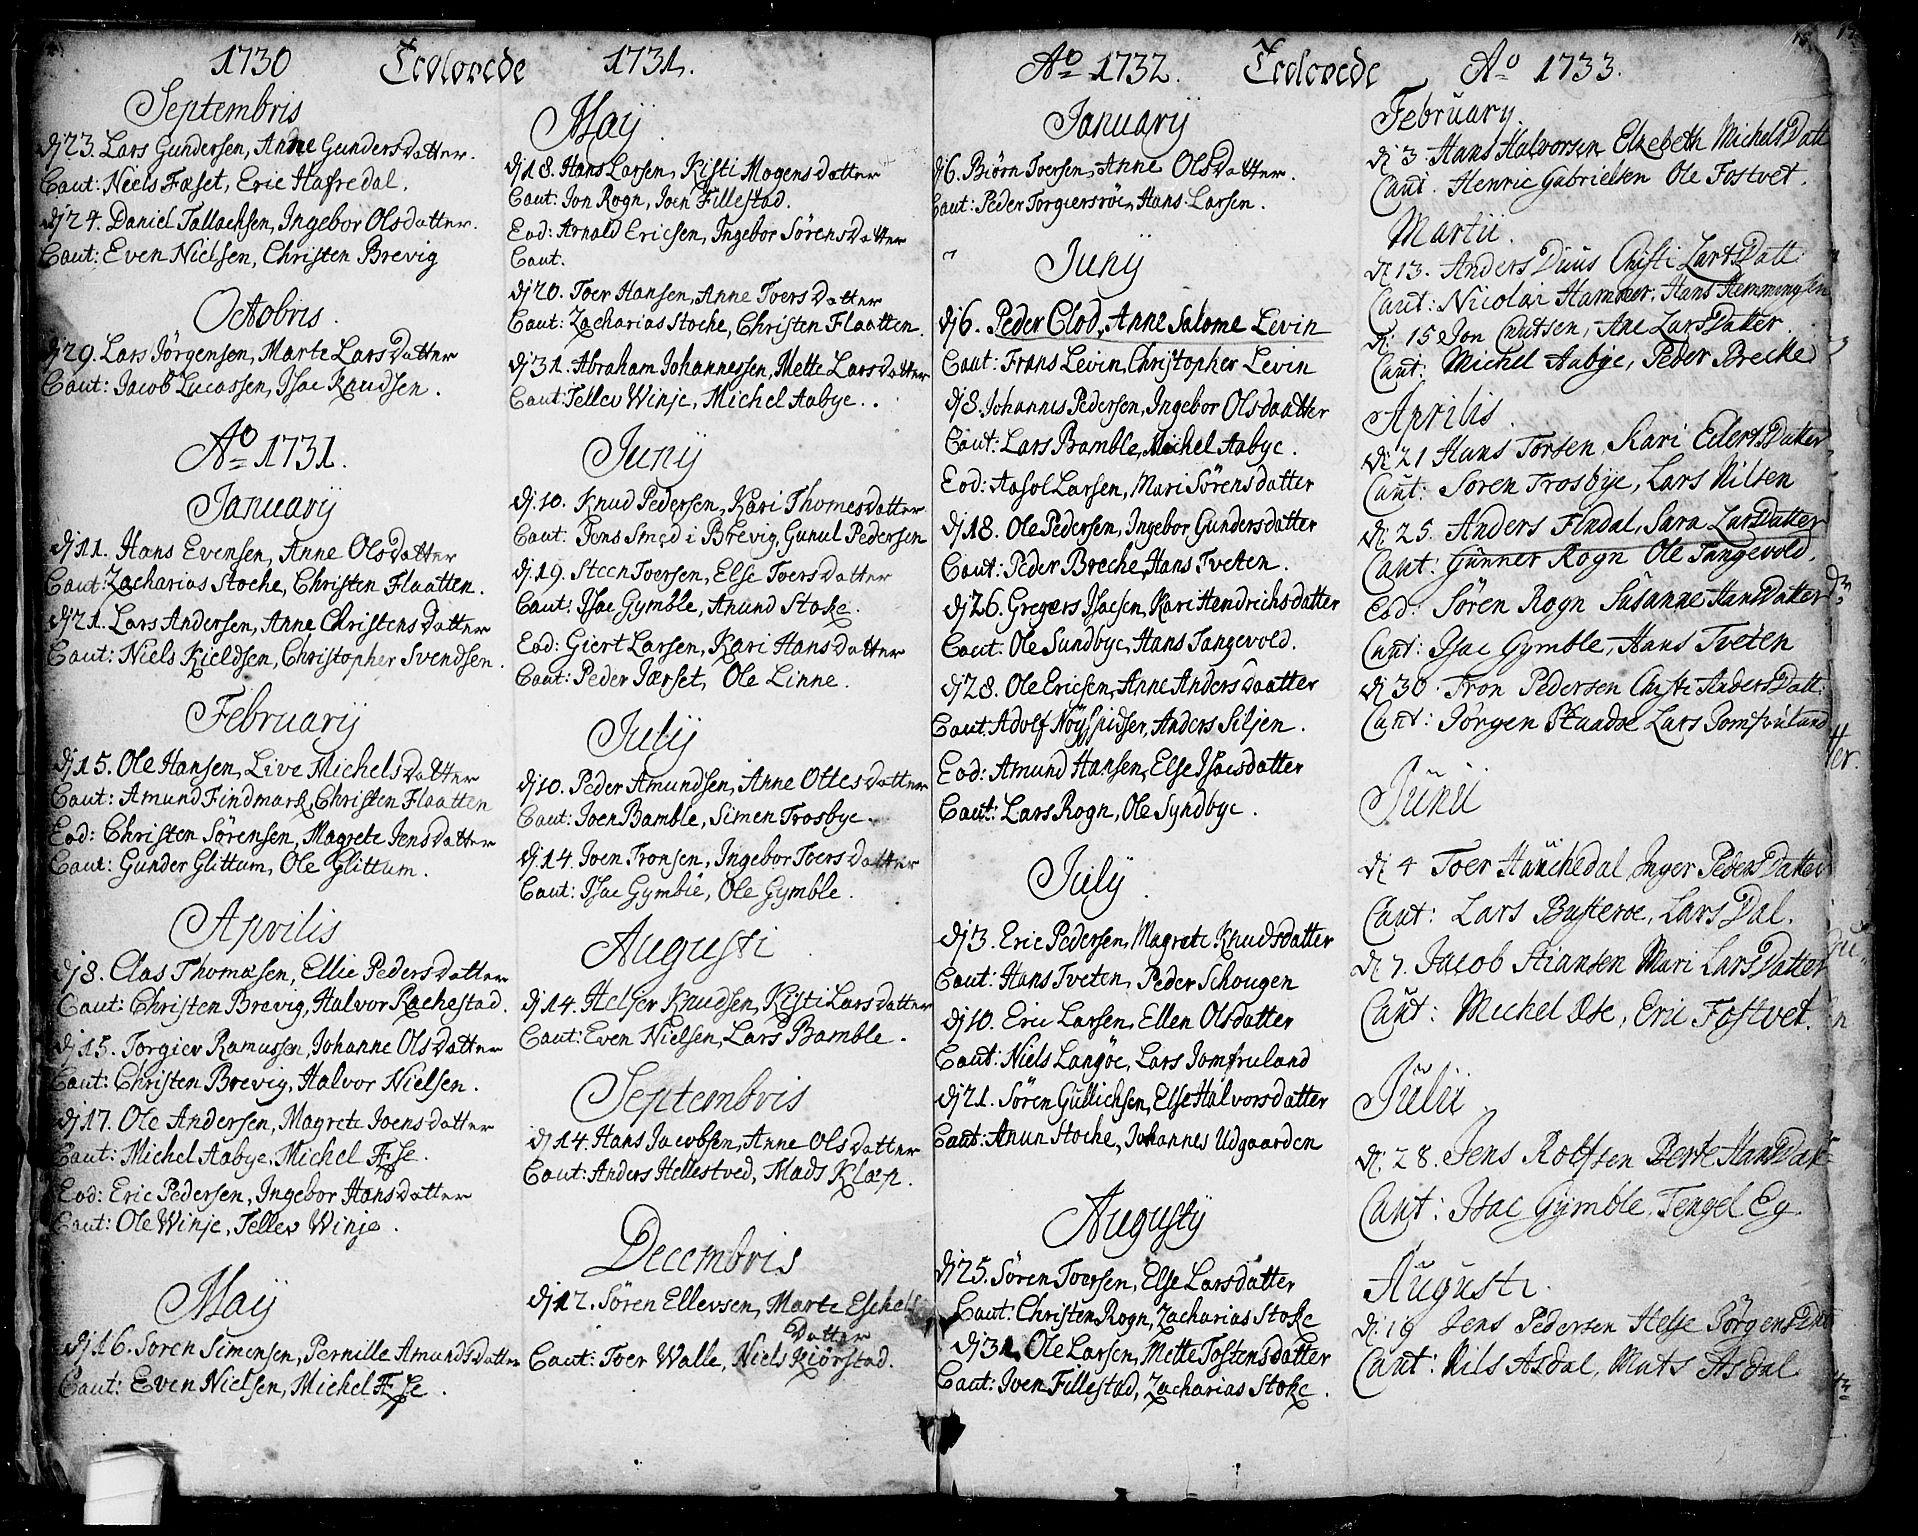 SAKO, Bamble kirkebøker, F/Fa/L0001: Ministerialbok nr. I 1, 1702-1774, s. 14-15